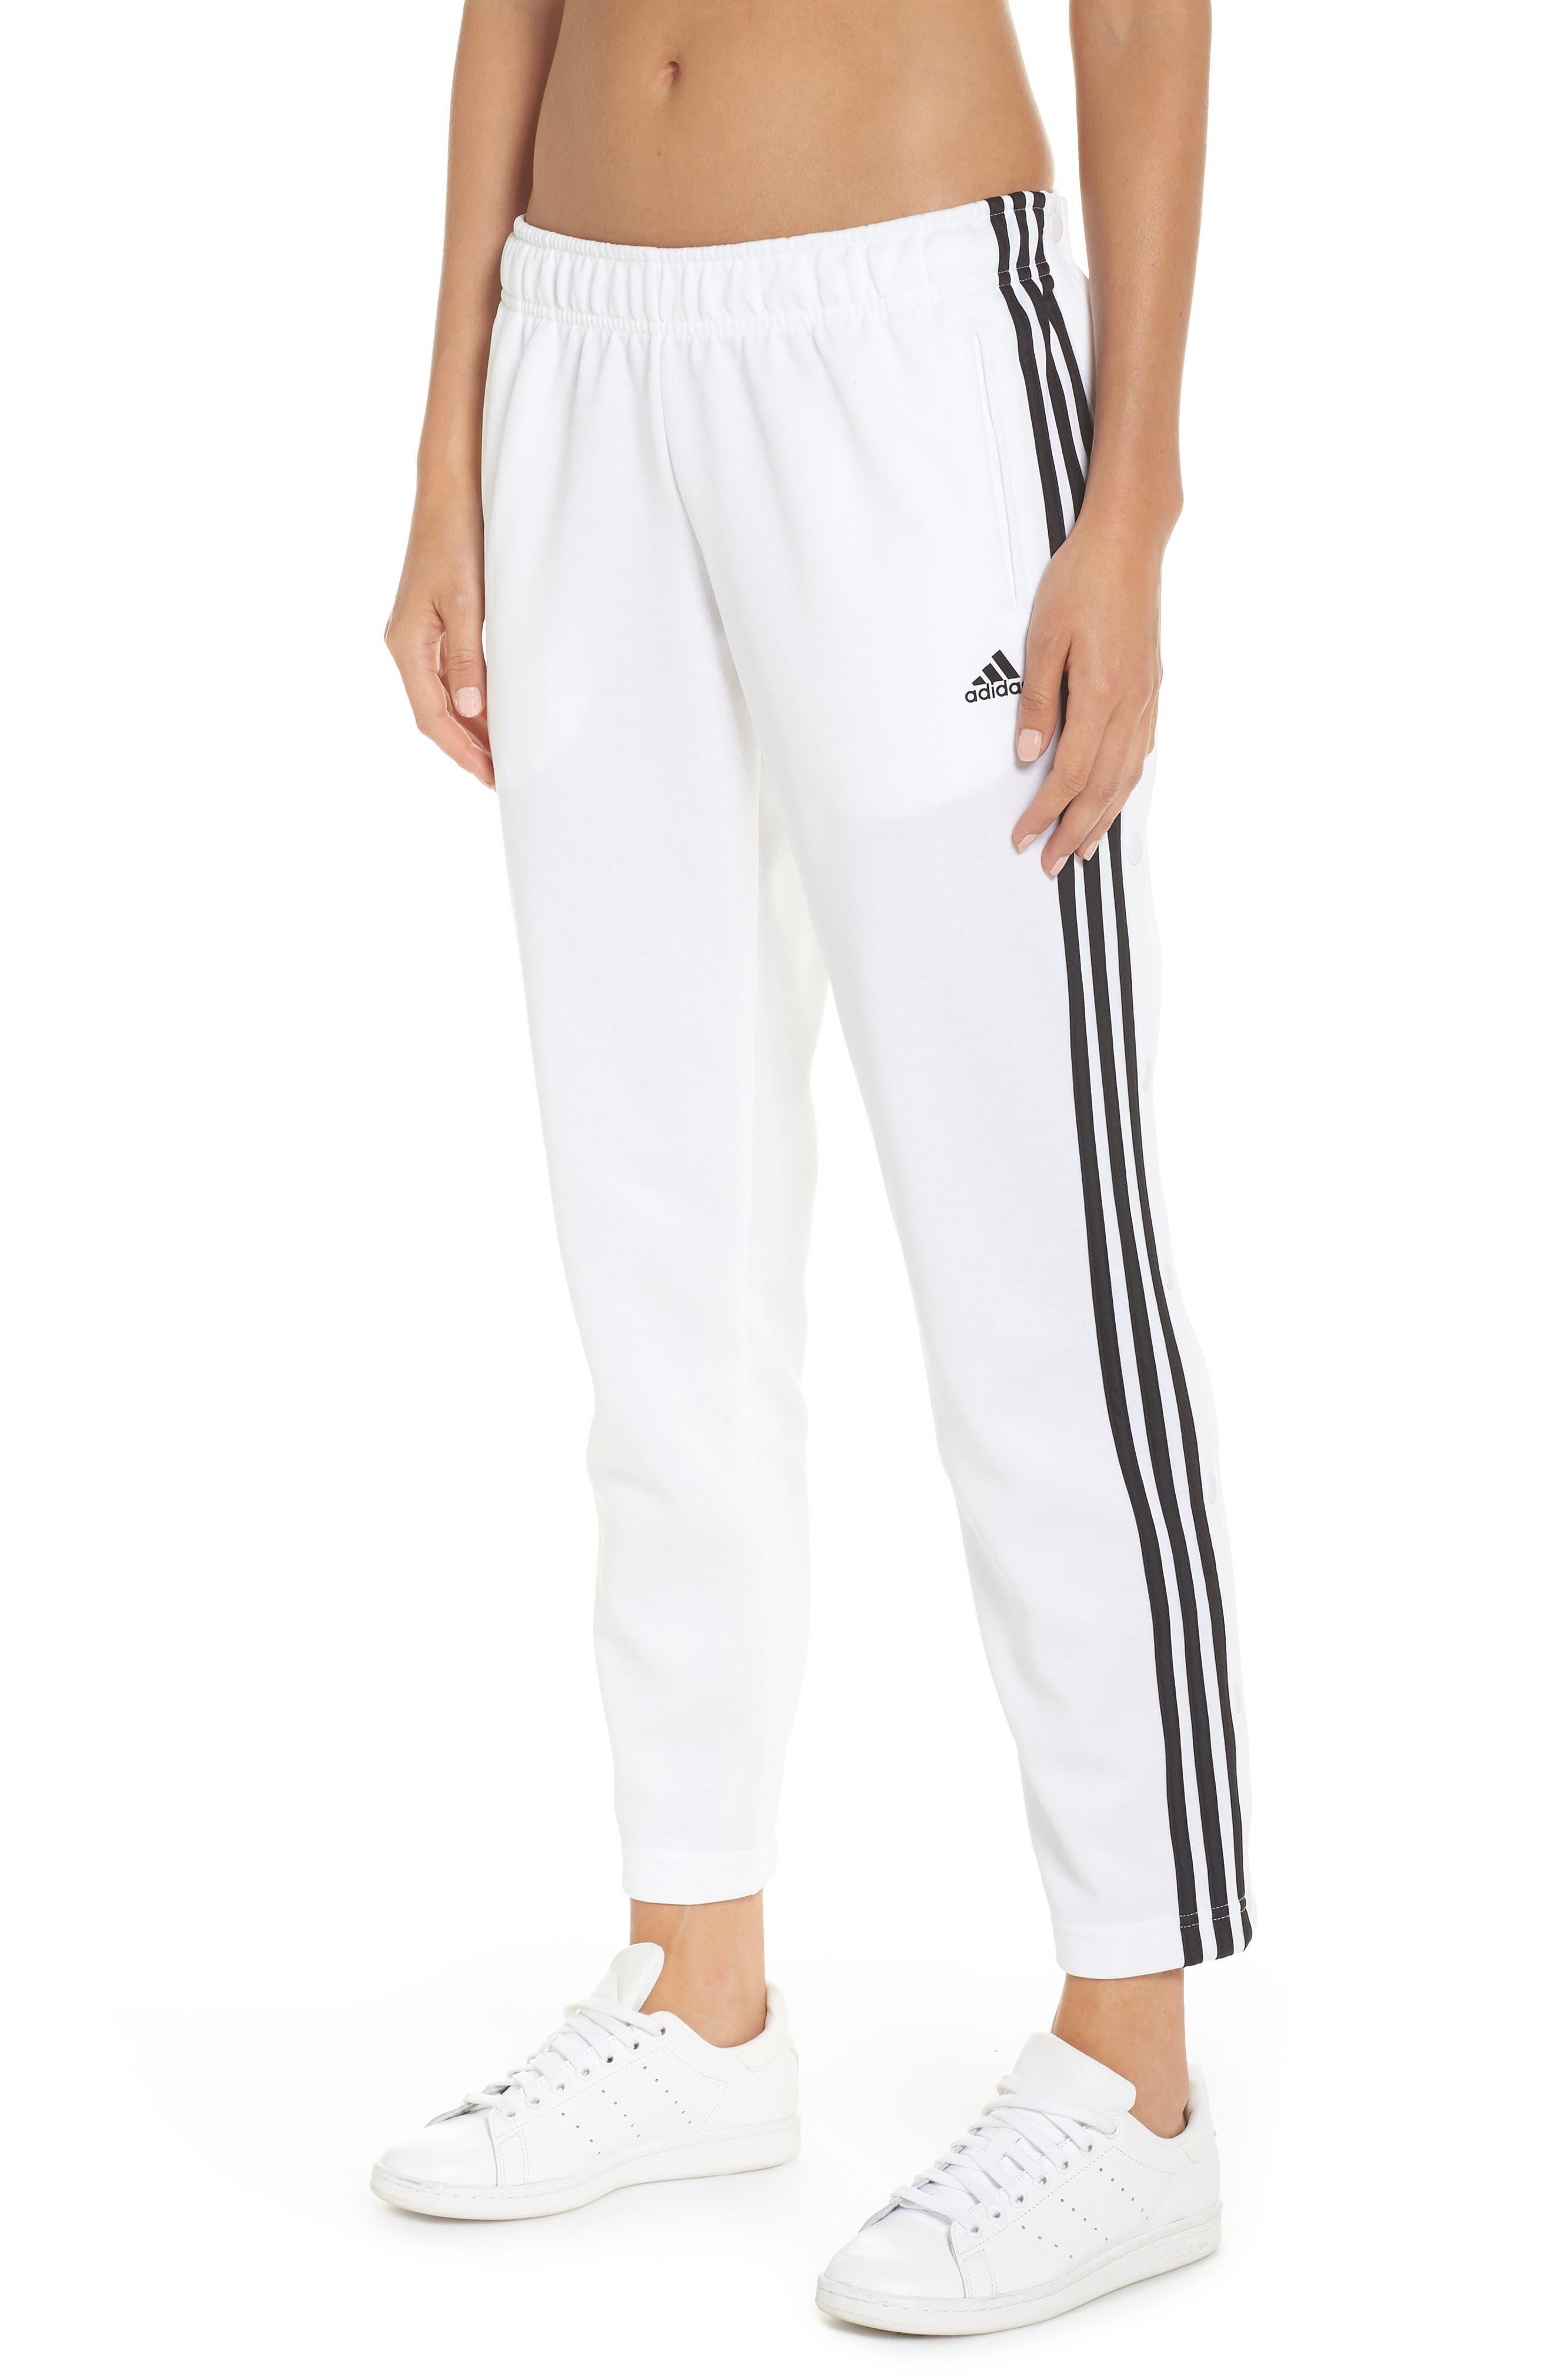 Tricot Snap Pants,                             Main thumbnail 1, color,                             White/ Black/ Black